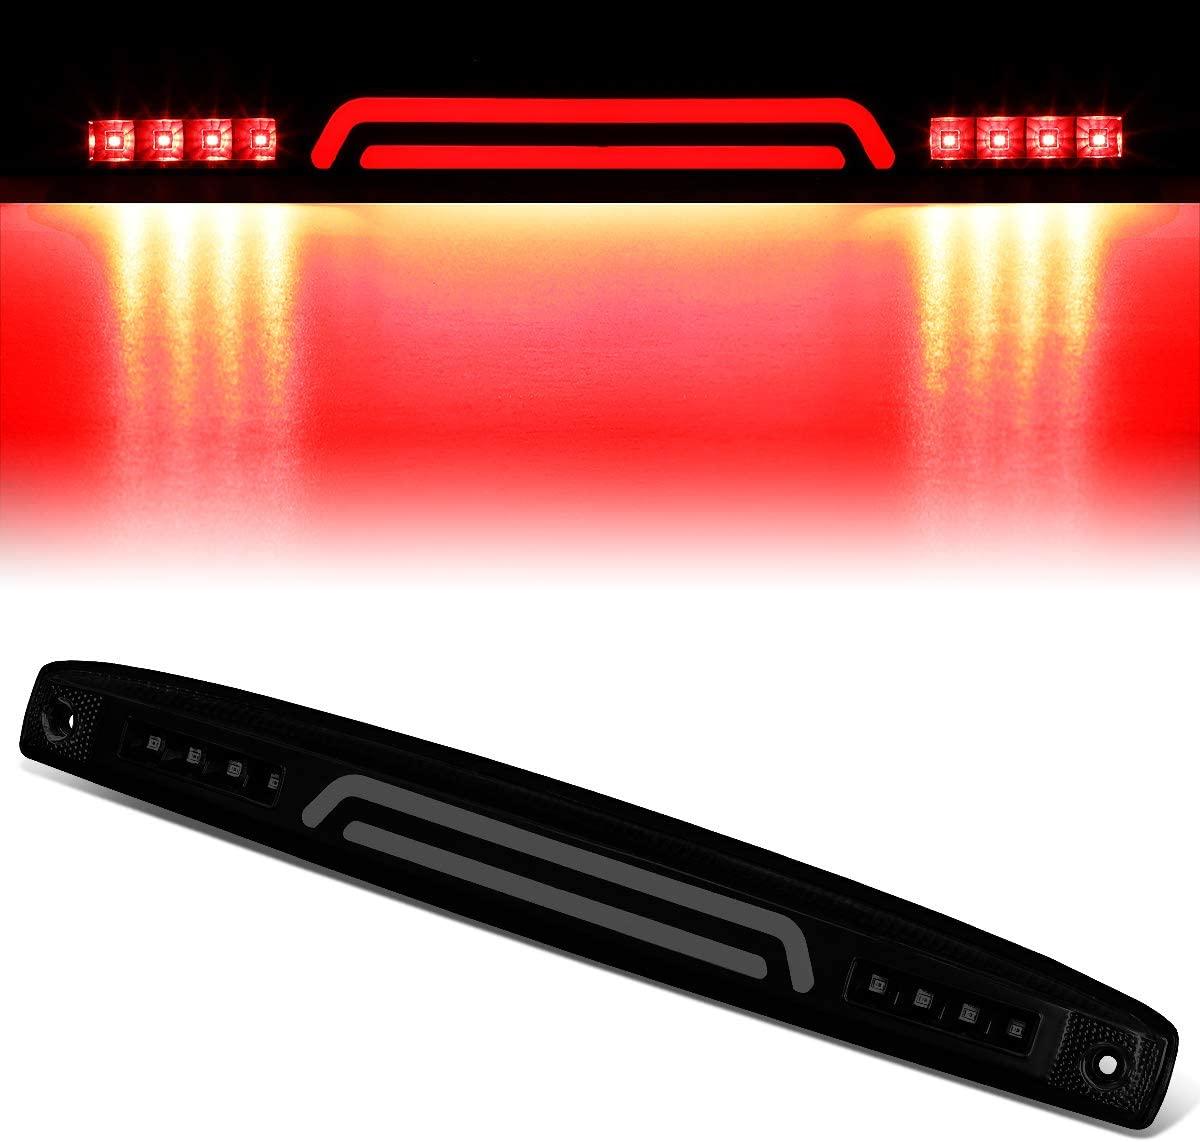 Tinted Housing 3D LED Bar Center Tailgate Lamp Brake Light Replacement for 03-06 Dodge Ram Truck 2500 3500